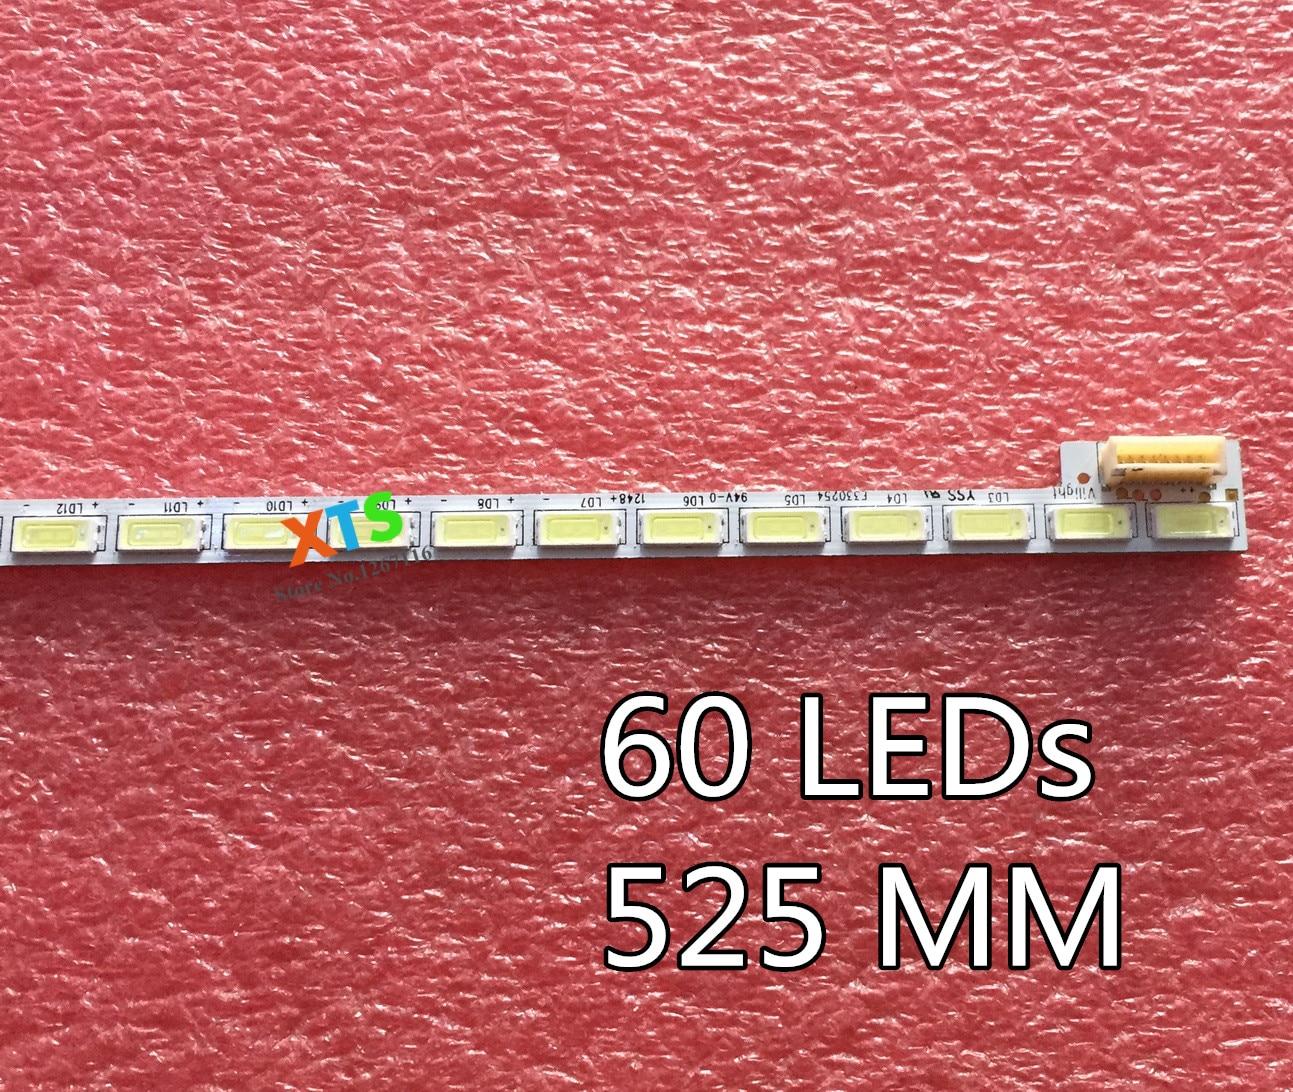 "Led-hintergrundbeleuchtung für LG Innotek 8 PIN 42LS5600-ZC LED TV 42 ""7030PKG 60ea 42LS560T 42LS570S 42LS575S T420HVN01.0 74.42T23.001- 2-DS1"